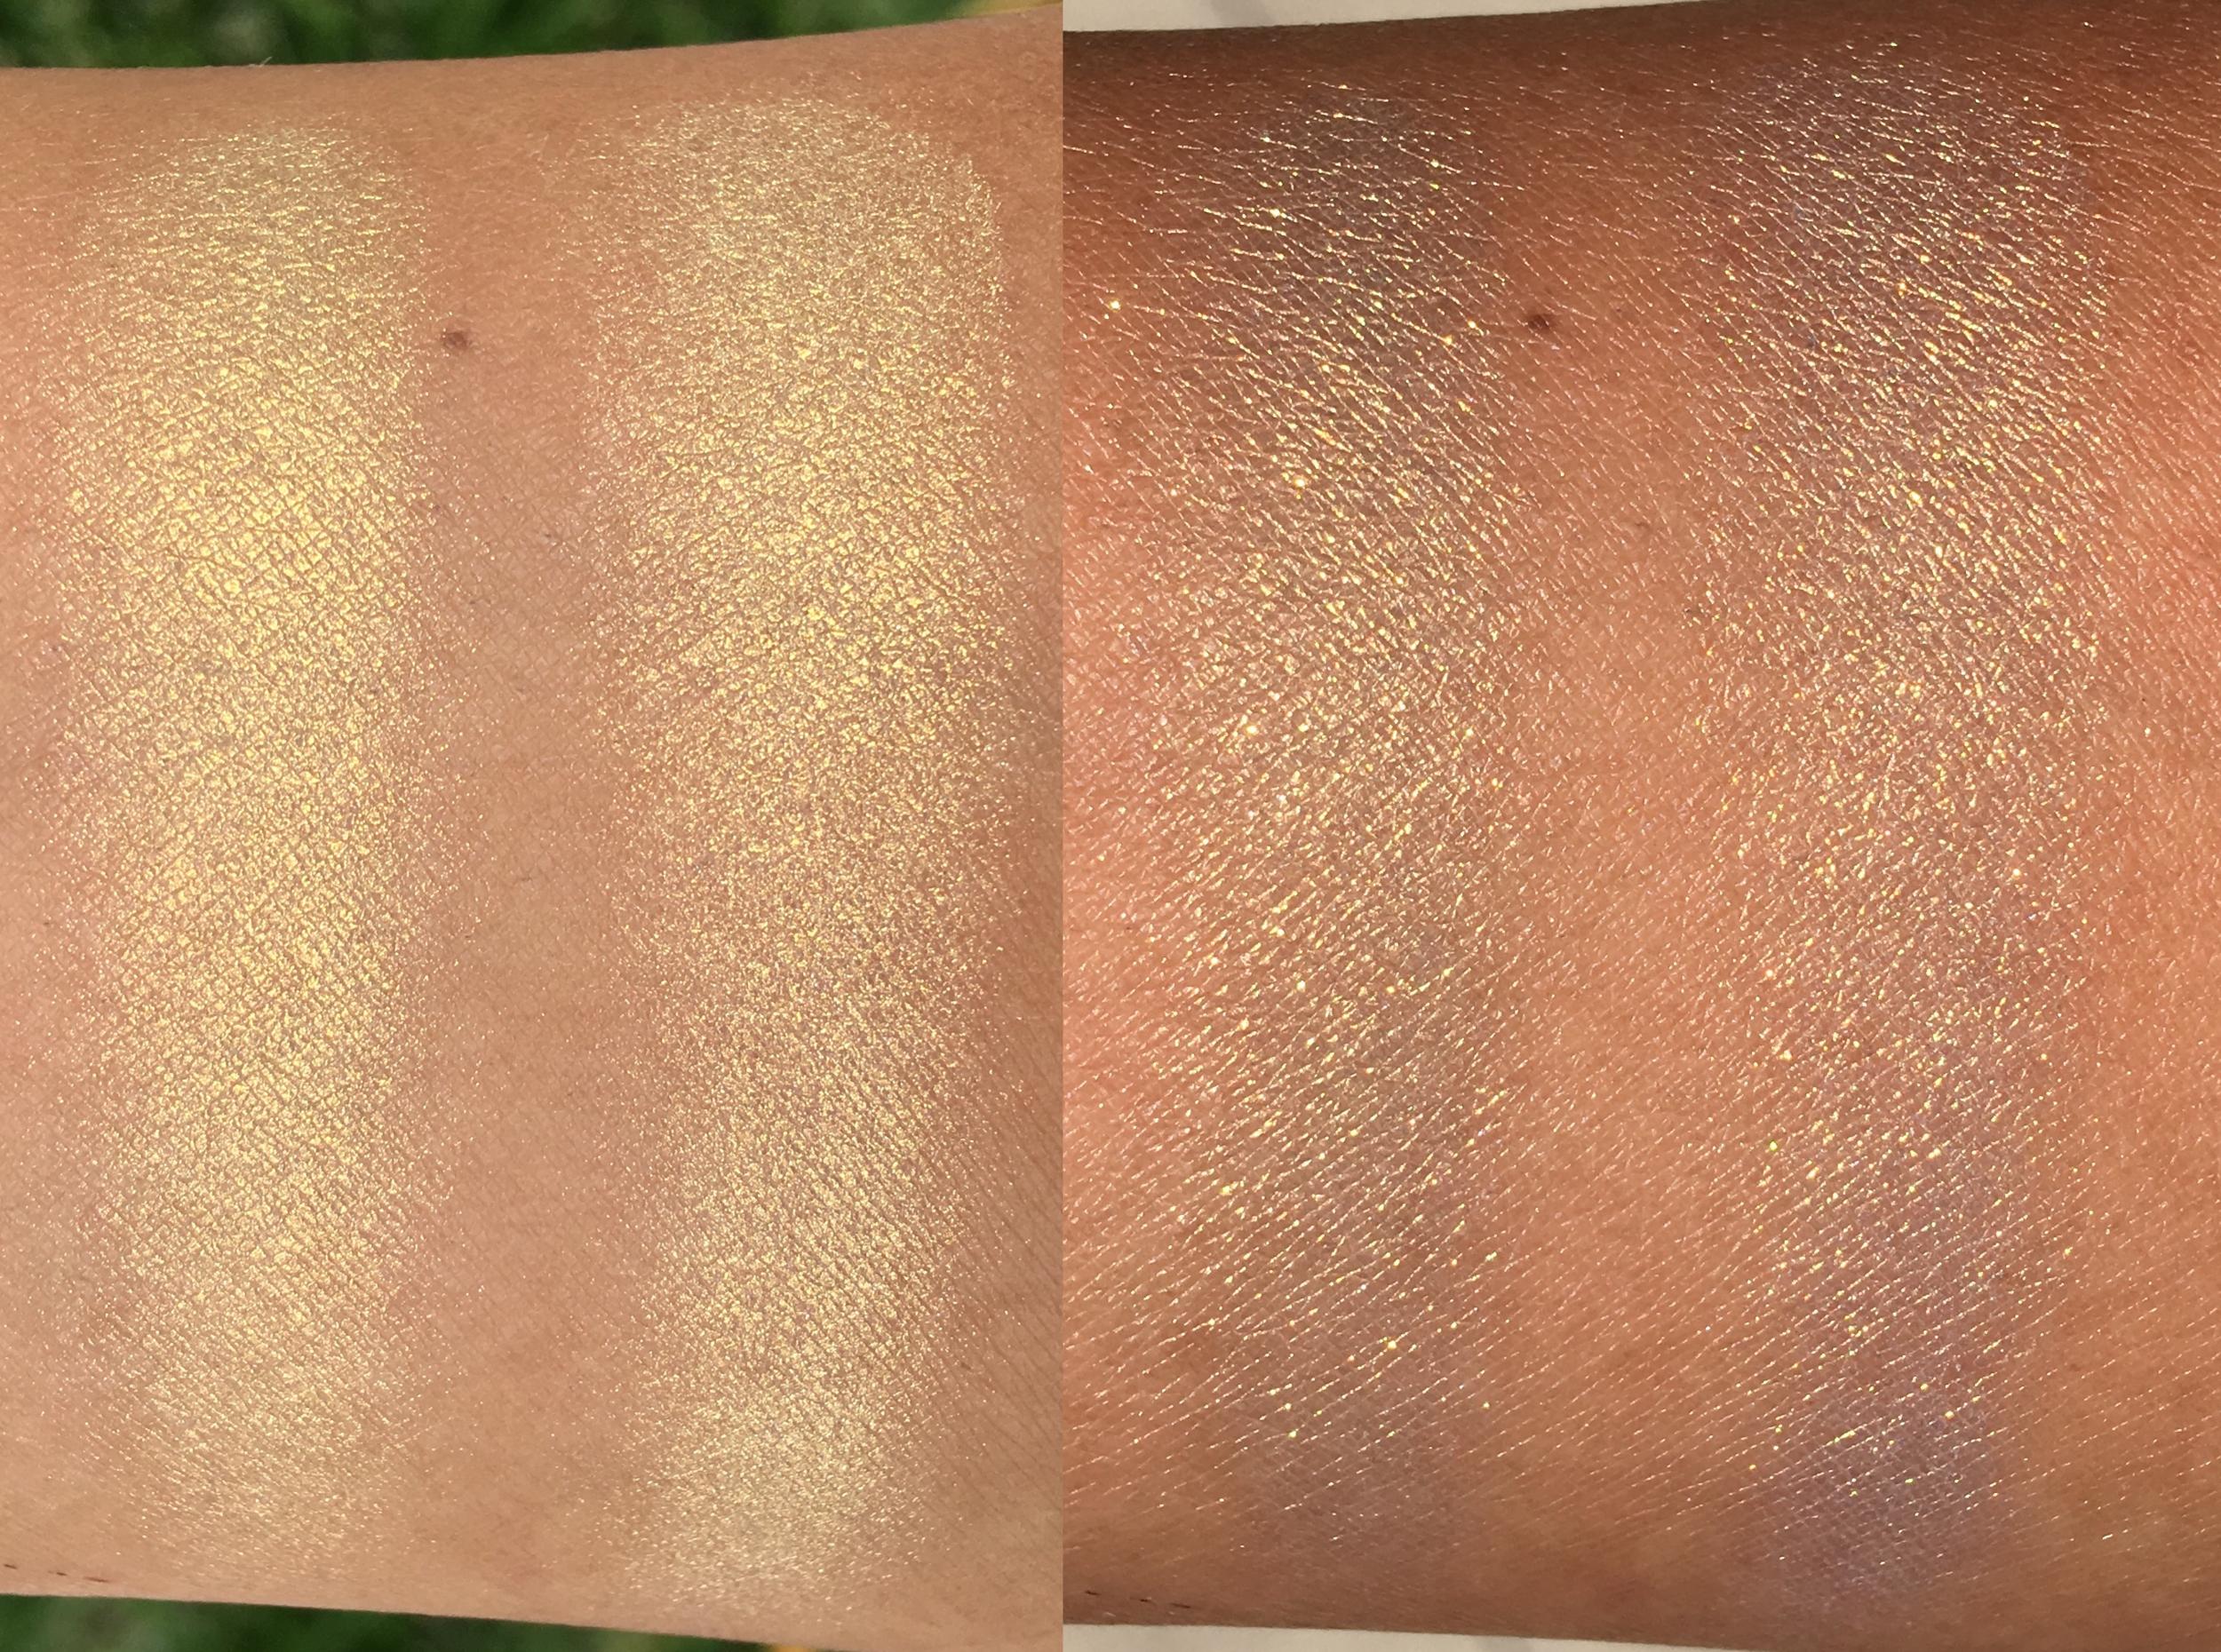 Left: indirect sunlight; Right: direct sunlight